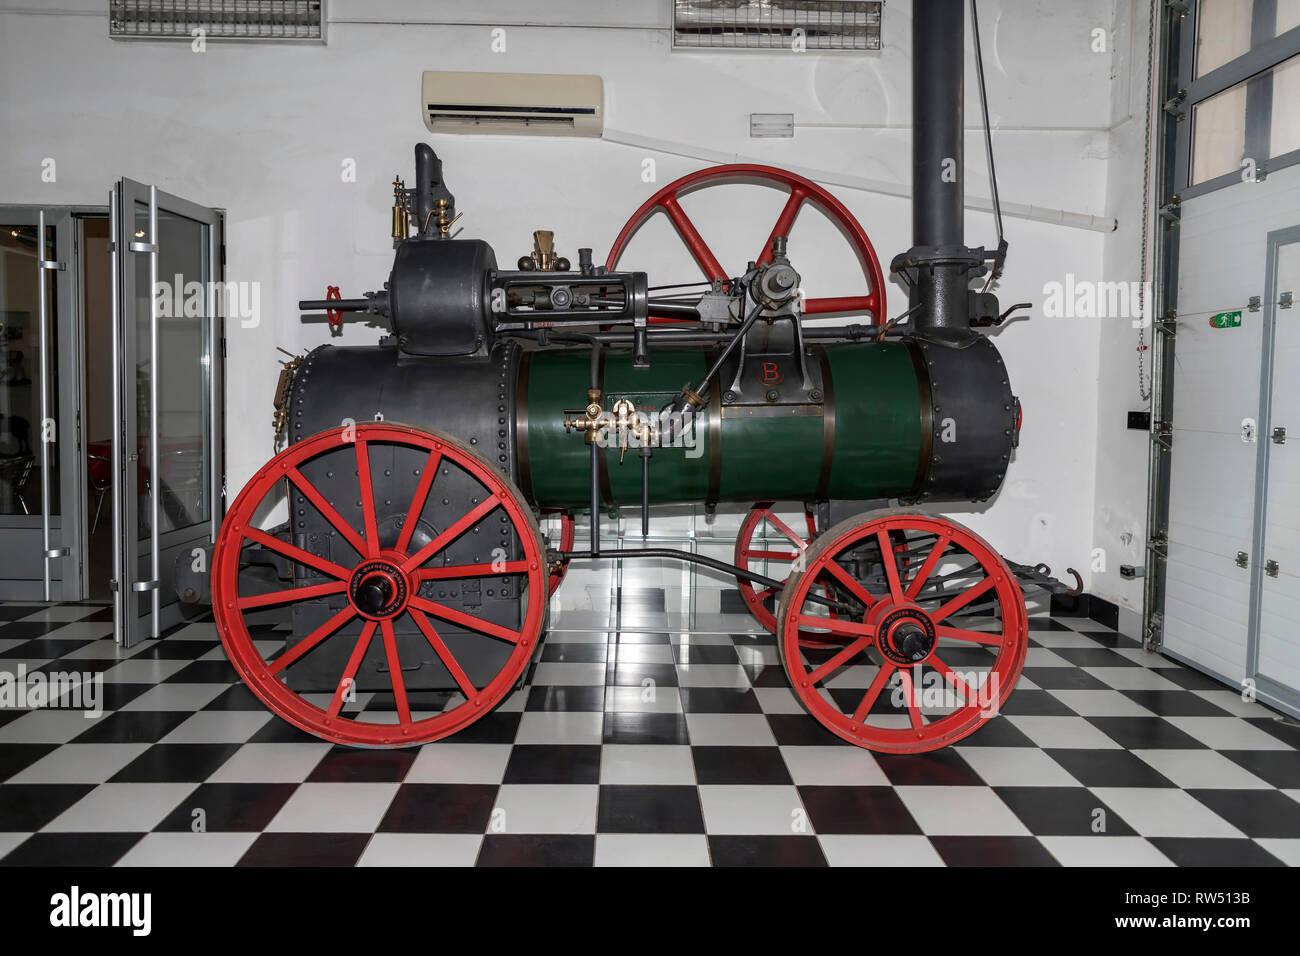 Belgrade, Serbia: Locomobile, movable steam engine used in